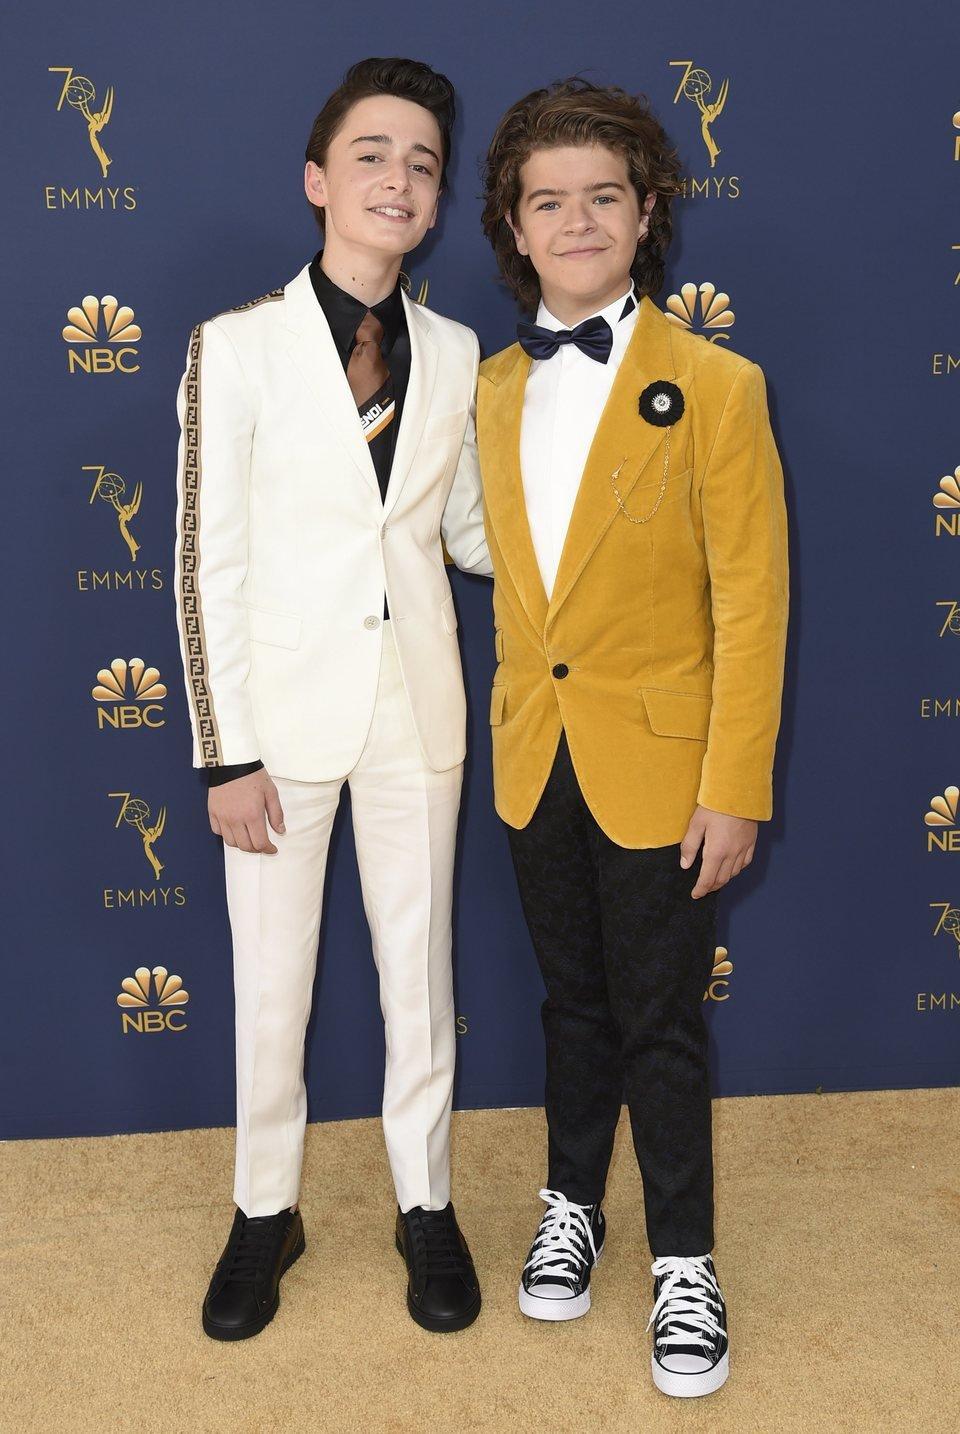 Gaten Matarazzo and Noah Schnapp at the Emmys 2018